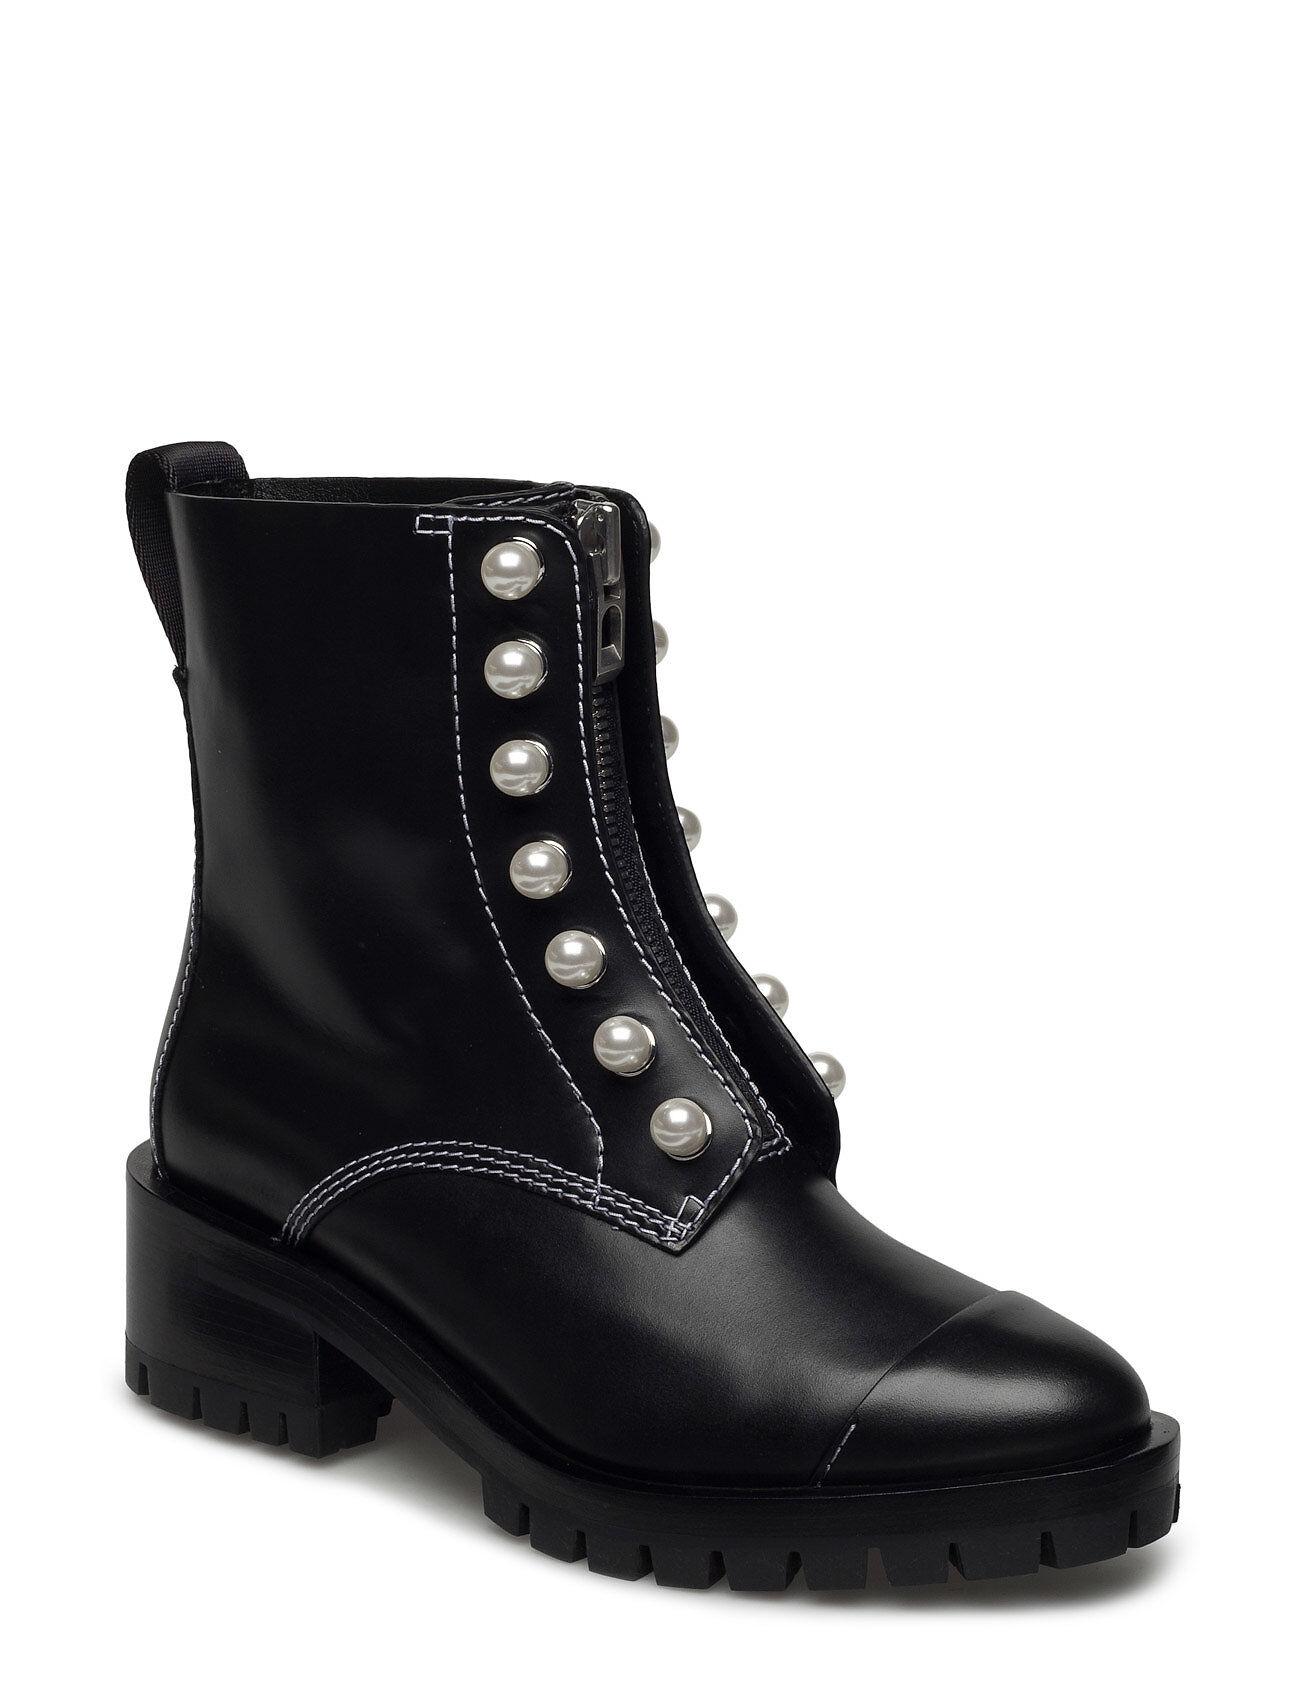 3.1 Phillip Lim Hayett - Lug Sole Zipper Boot With Pearls